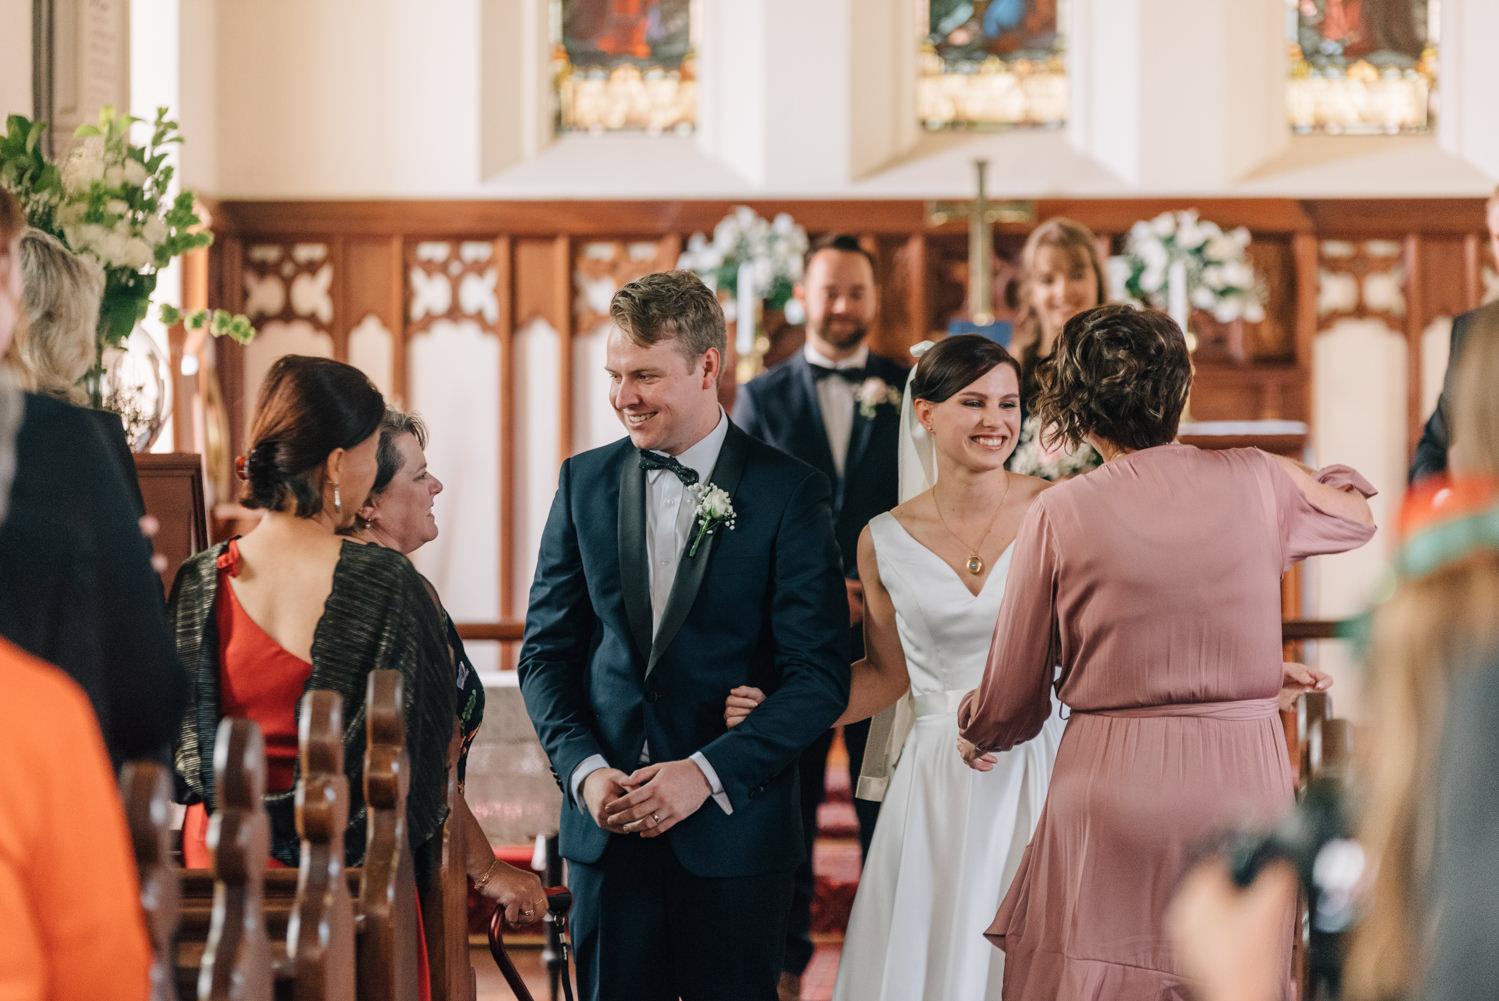 Josef-Chromy-Wedding-Photographer-35.jpg